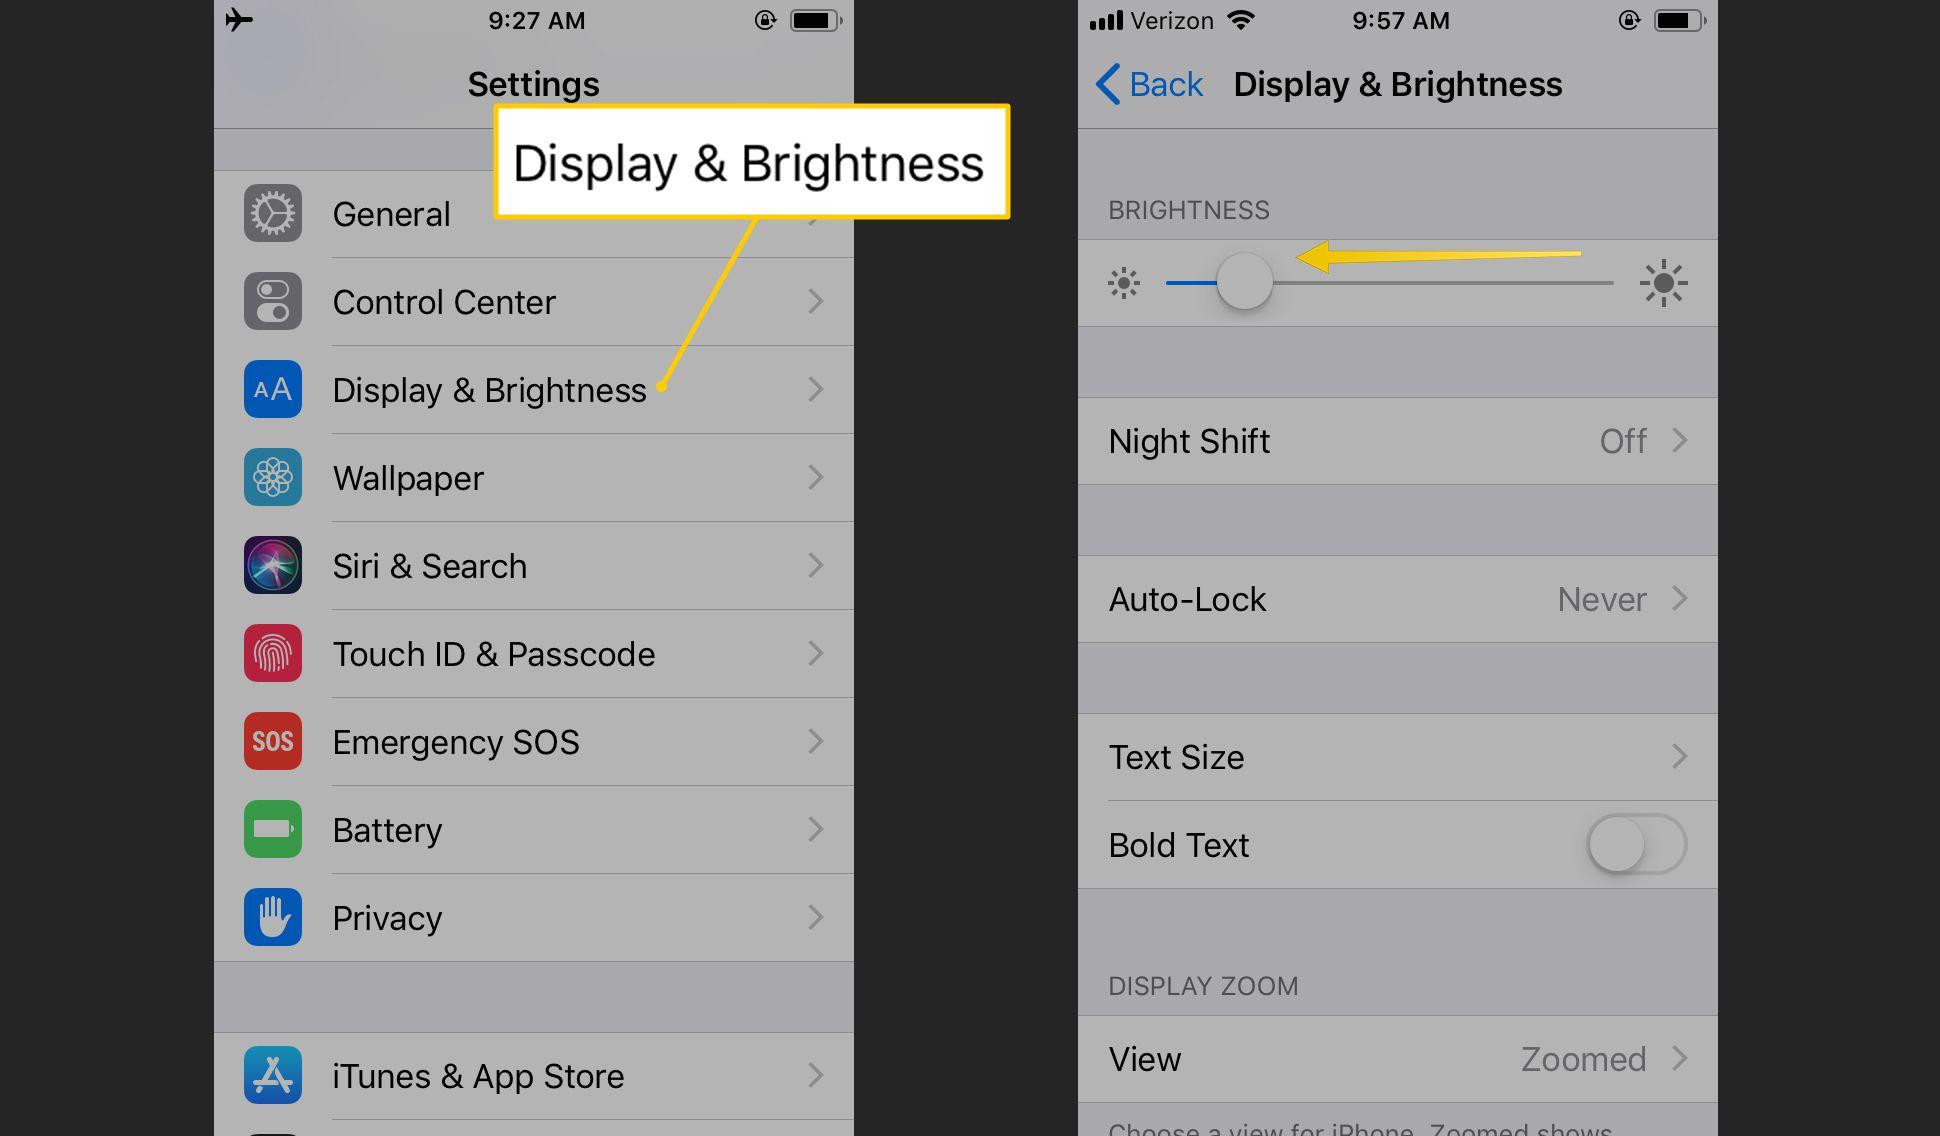 Display & Brightness, slider set low